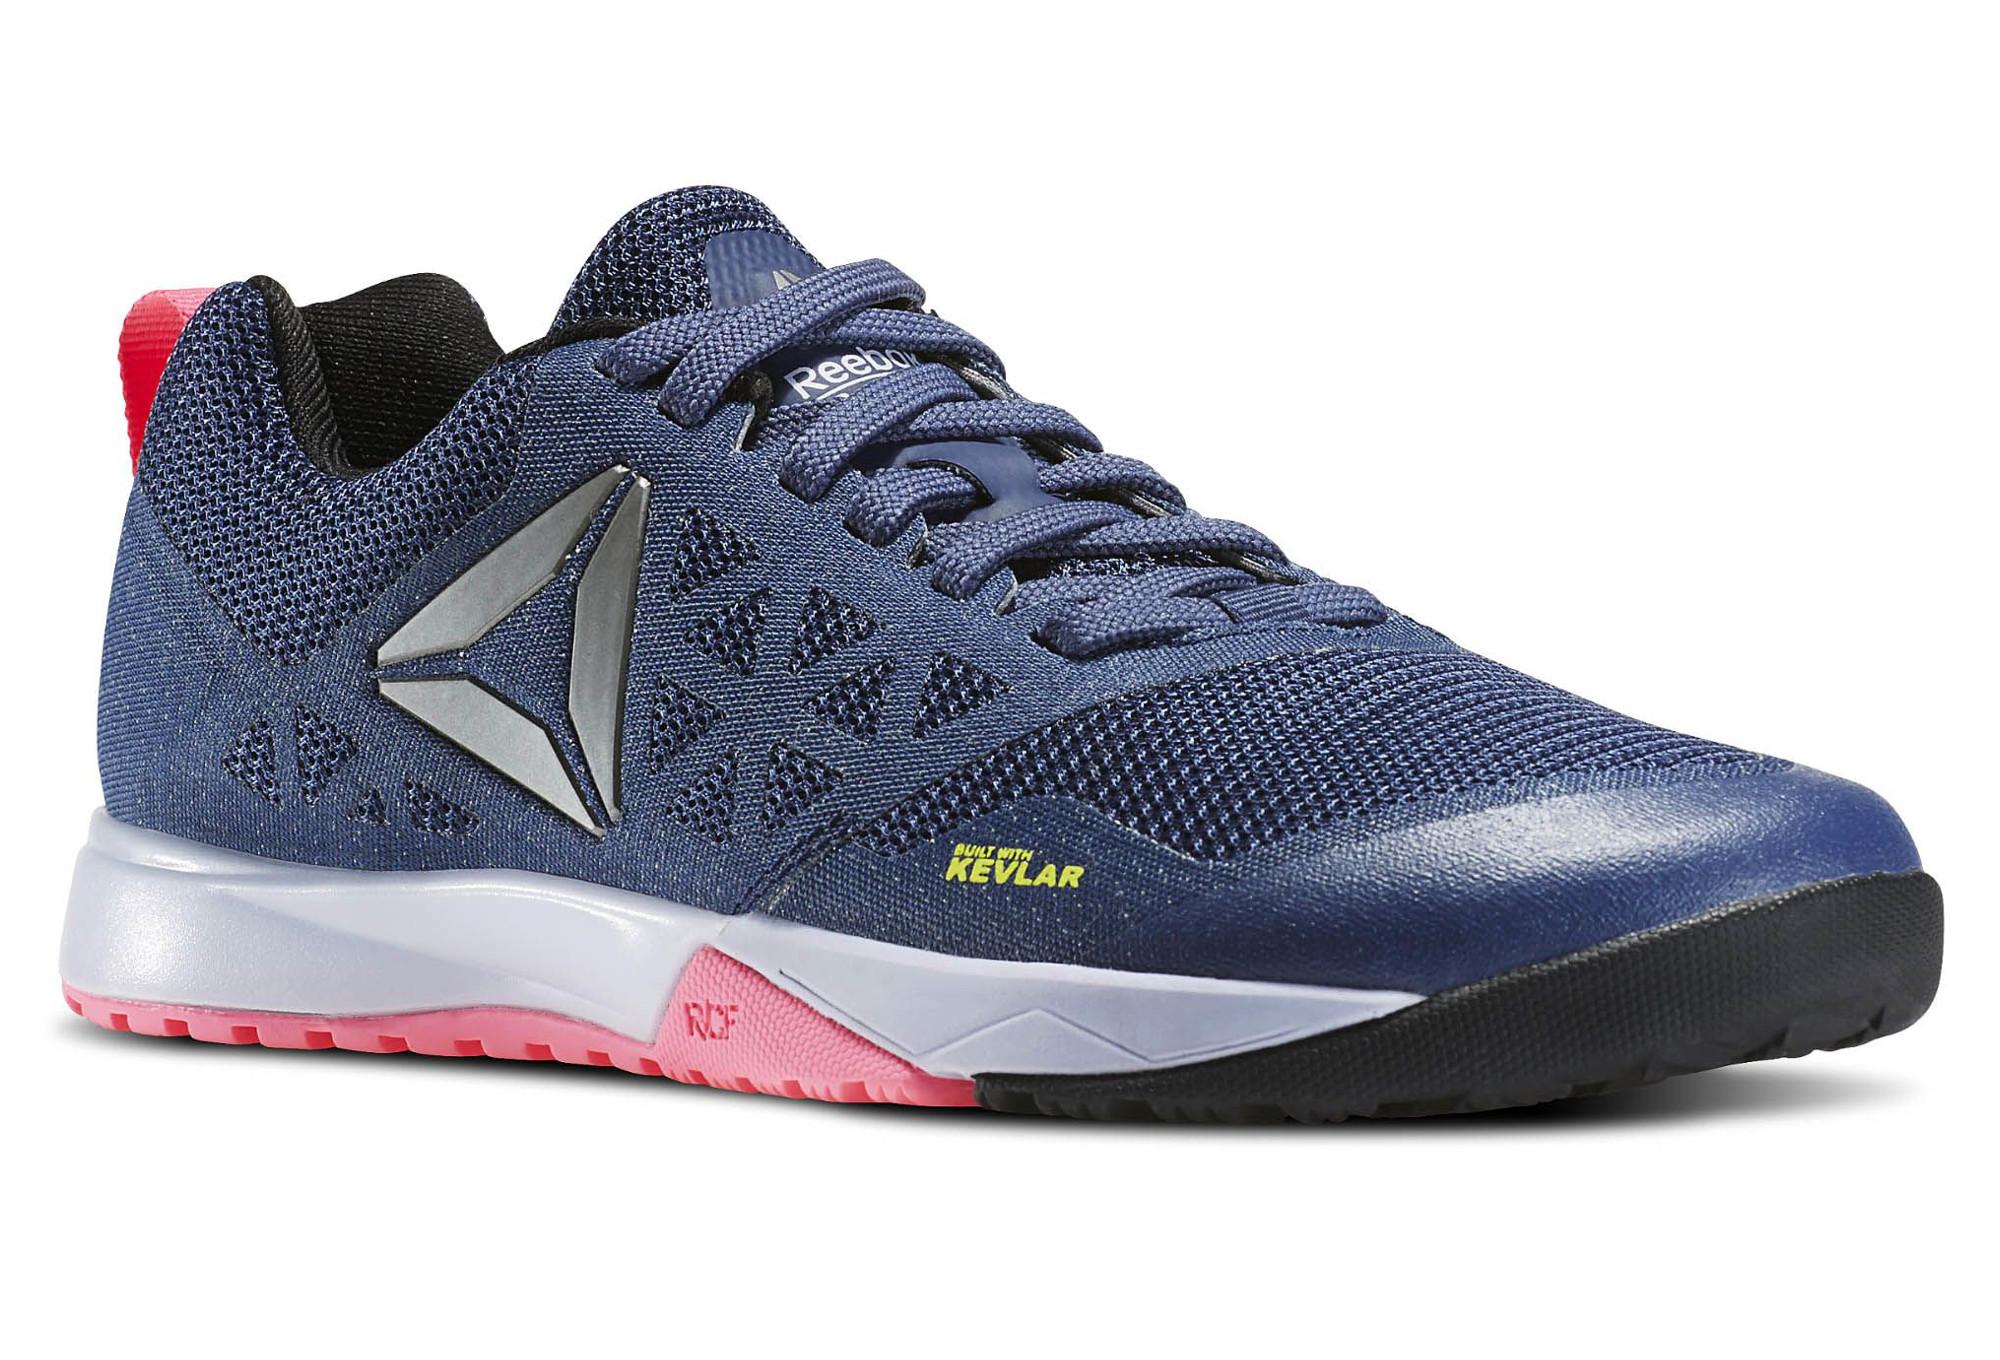 chaussures de cross training femme reebok crossfit nano 6 0 bleu. Black Bedroom Furniture Sets. Home Design Ideas